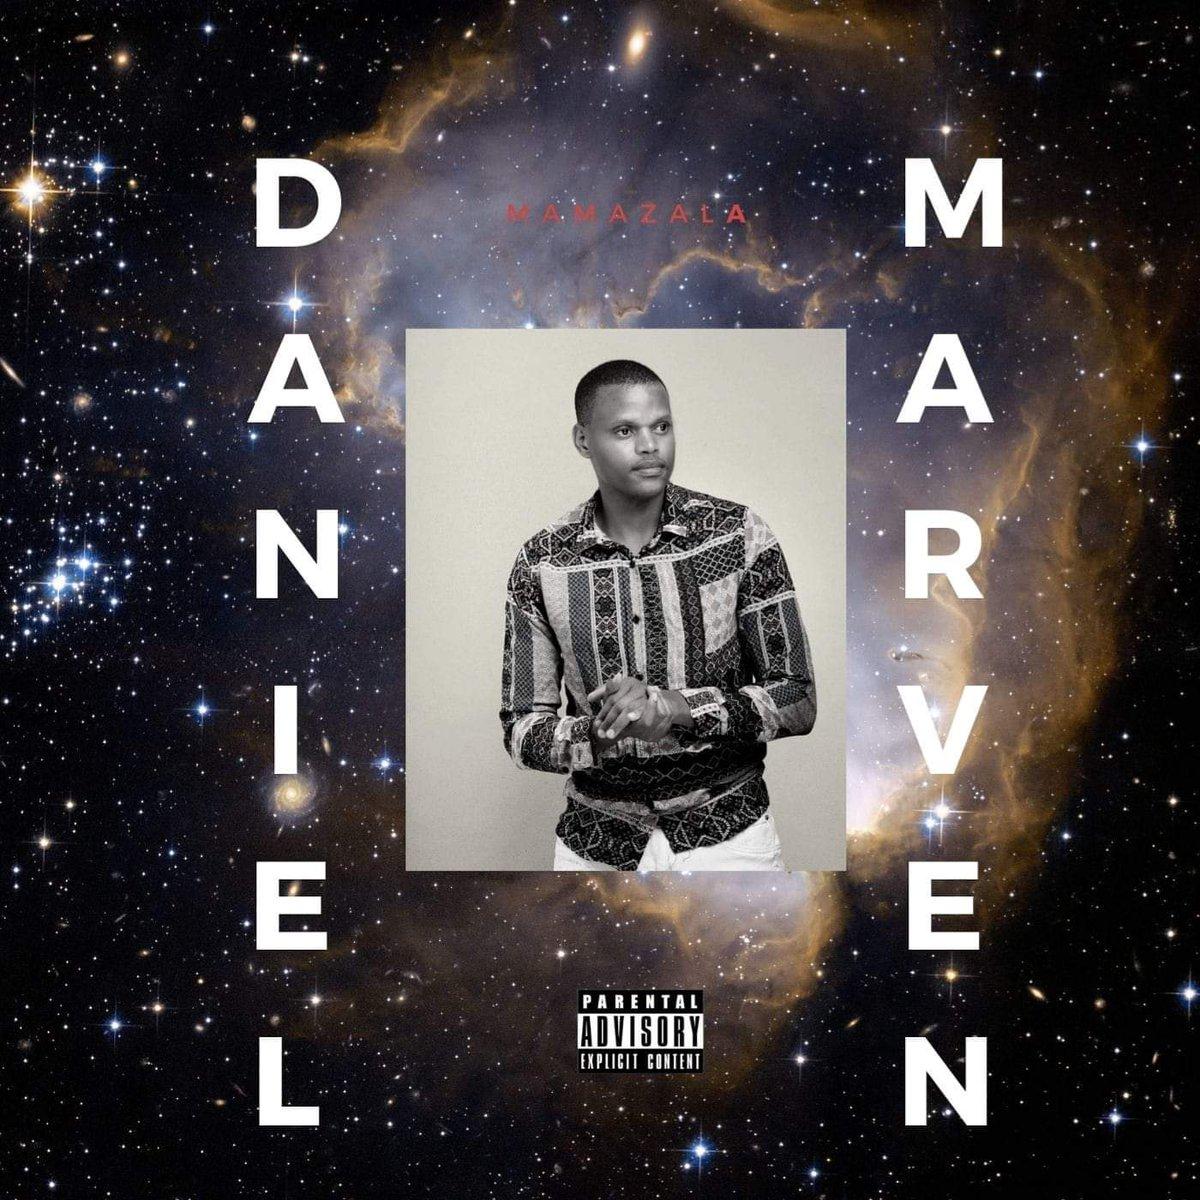 Official release of #mamazala hit single Amapiano is a lifestyle by @danielmarven 💯💕  Music links. Download Mamazala on  Spotify..  https://open.spotify.com/album/73ruEoMhPHMDqUKmkHRFtx?si=DHfN-JufSpqqfJOa0pFbtA…  ITunes https://music.apple.com/us/album/mamazala-single/1468710420?uo=4&app=itunes…